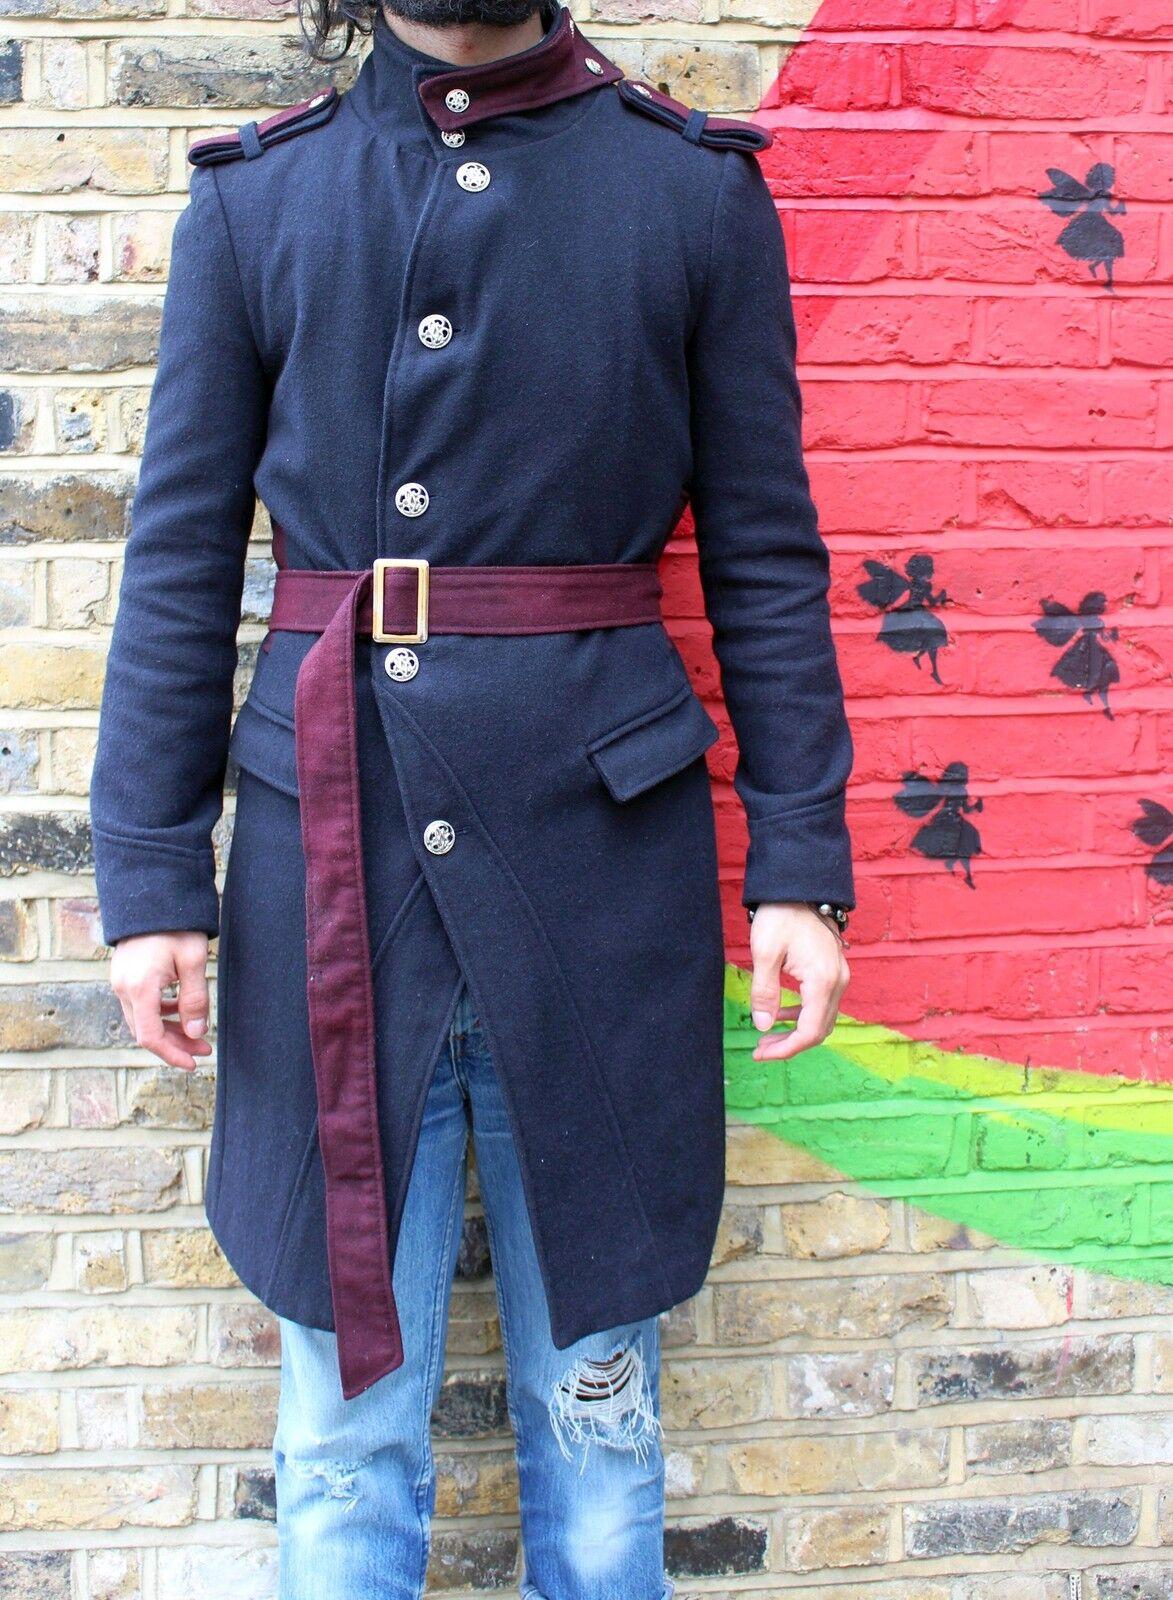 Herren ASYMMETRIC COAT Small wool all navy, longline military S M 36 saints belted